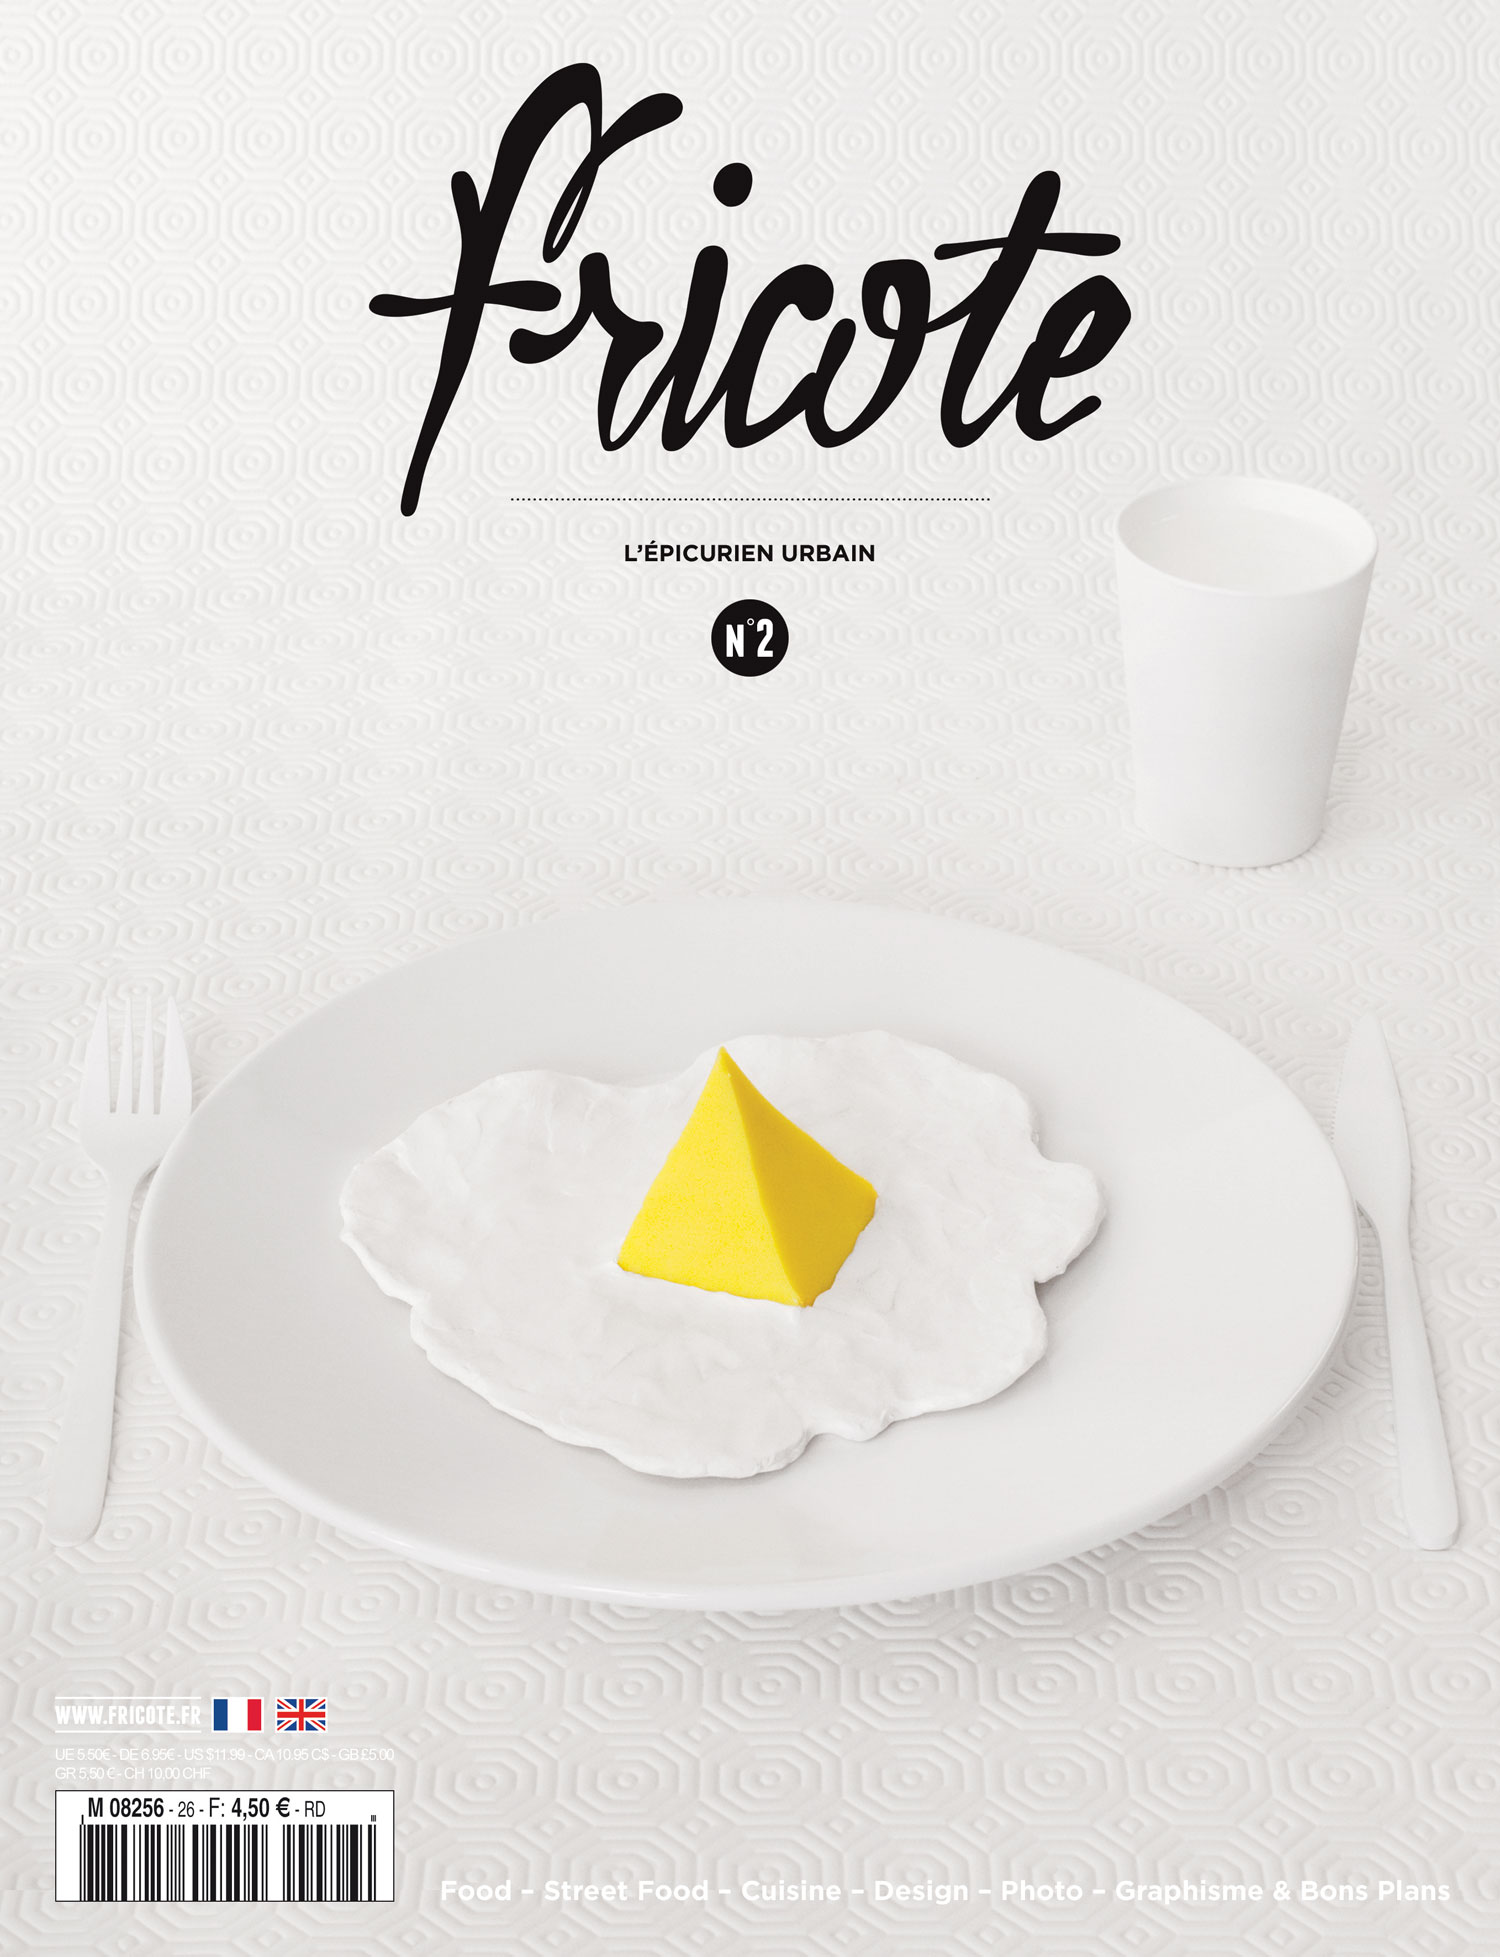 fricote2.jpg